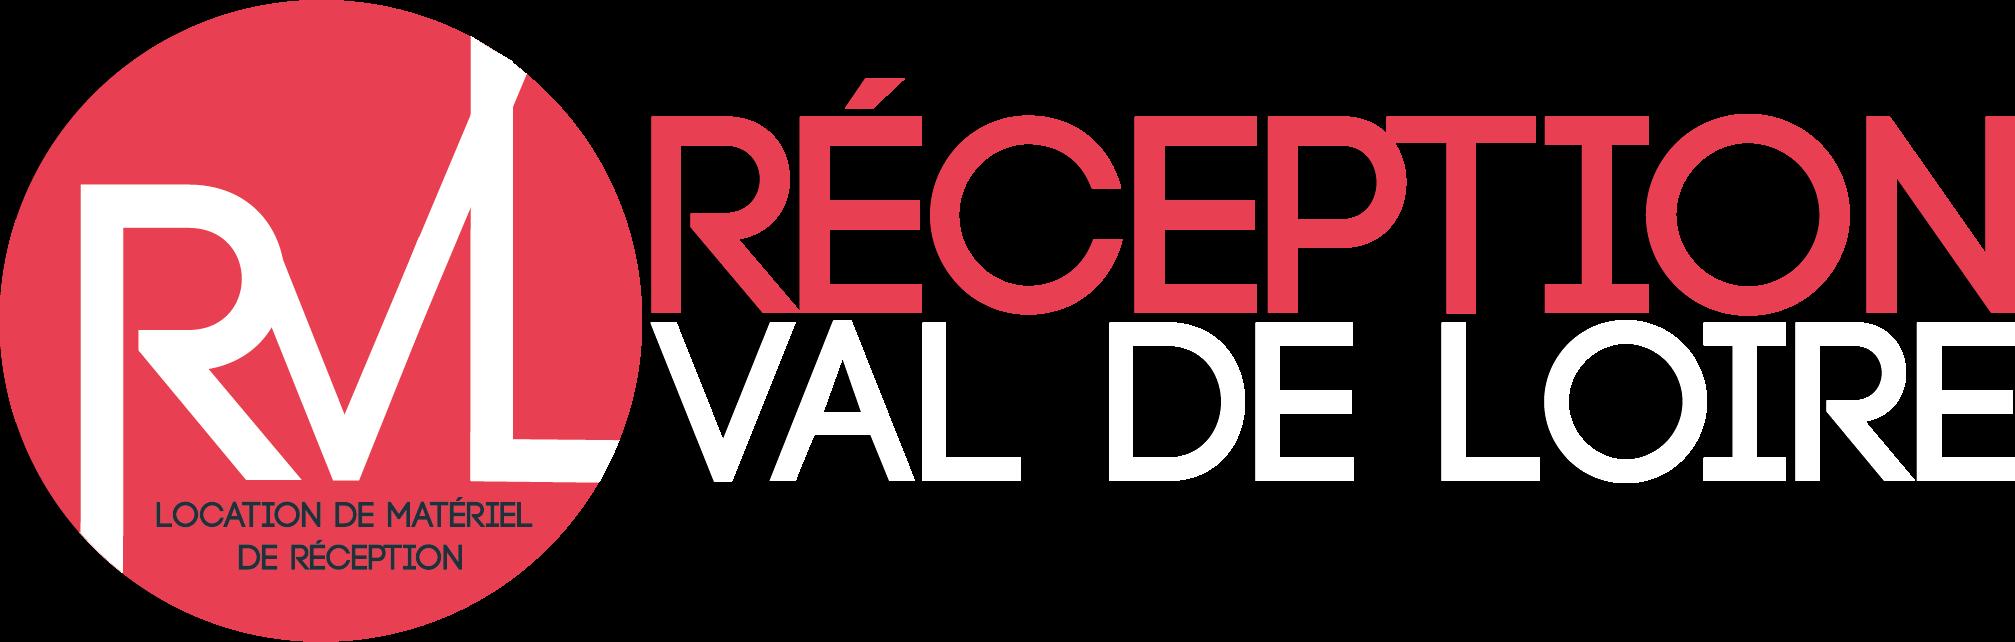 receptionvaldeloire